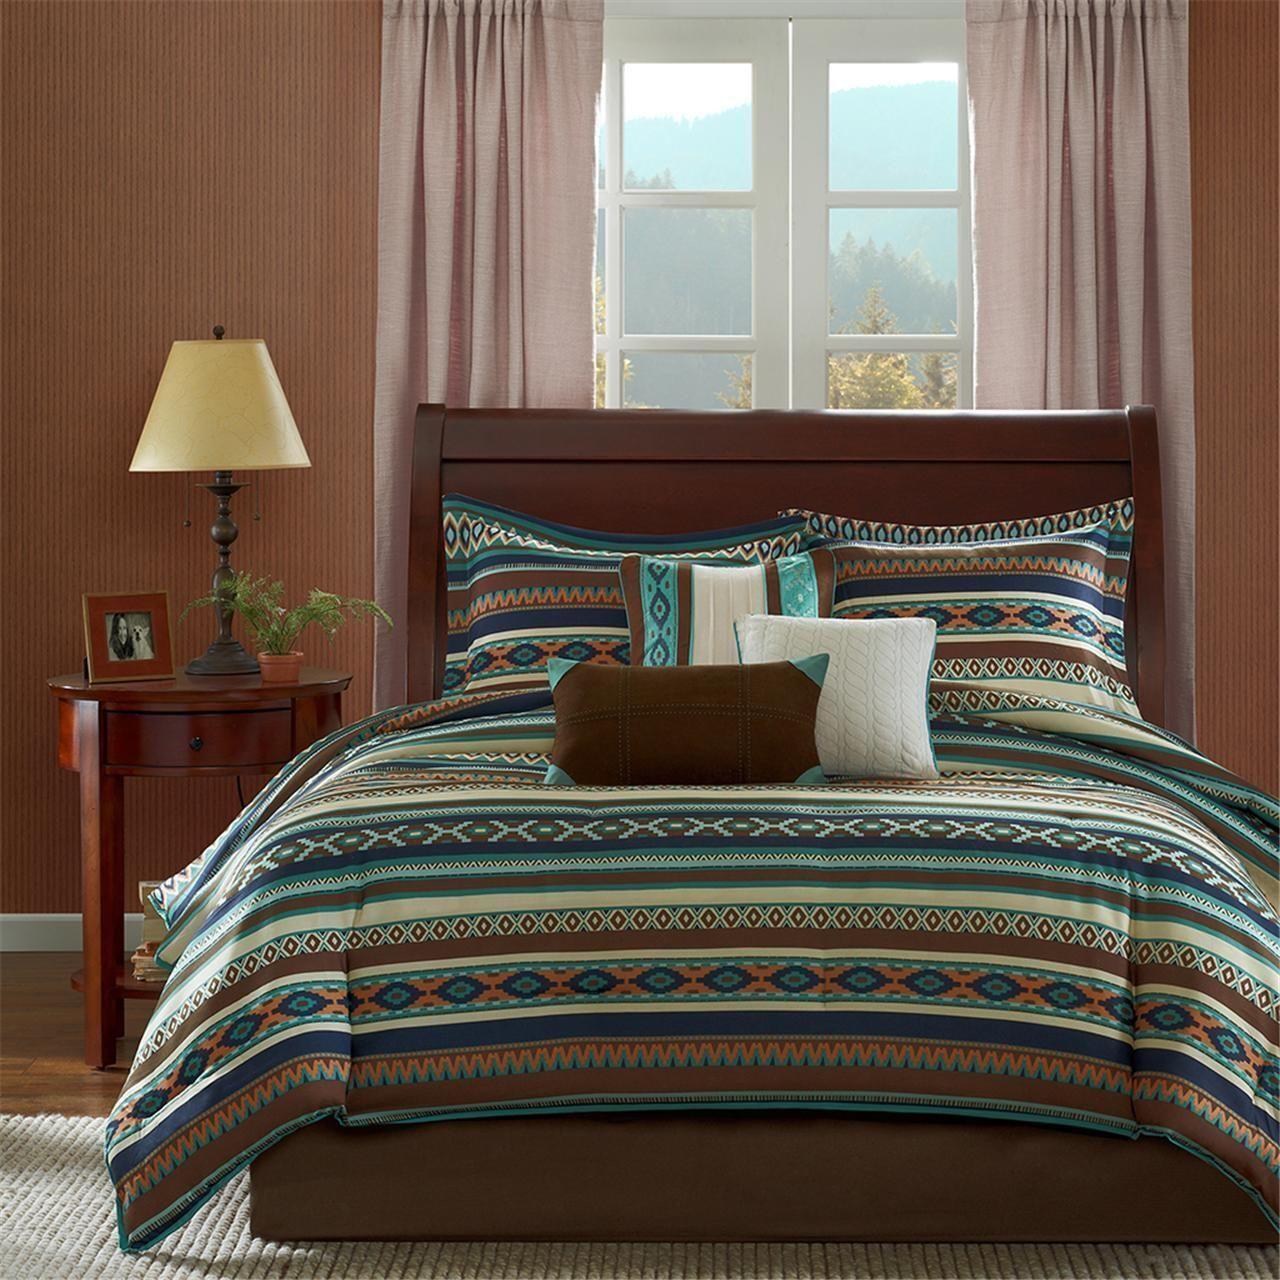 BEAUTIFUL COZY LODGE CABIN RUSTIC Blau braun COUNTRY STRIPE COMFORTER SET NEW